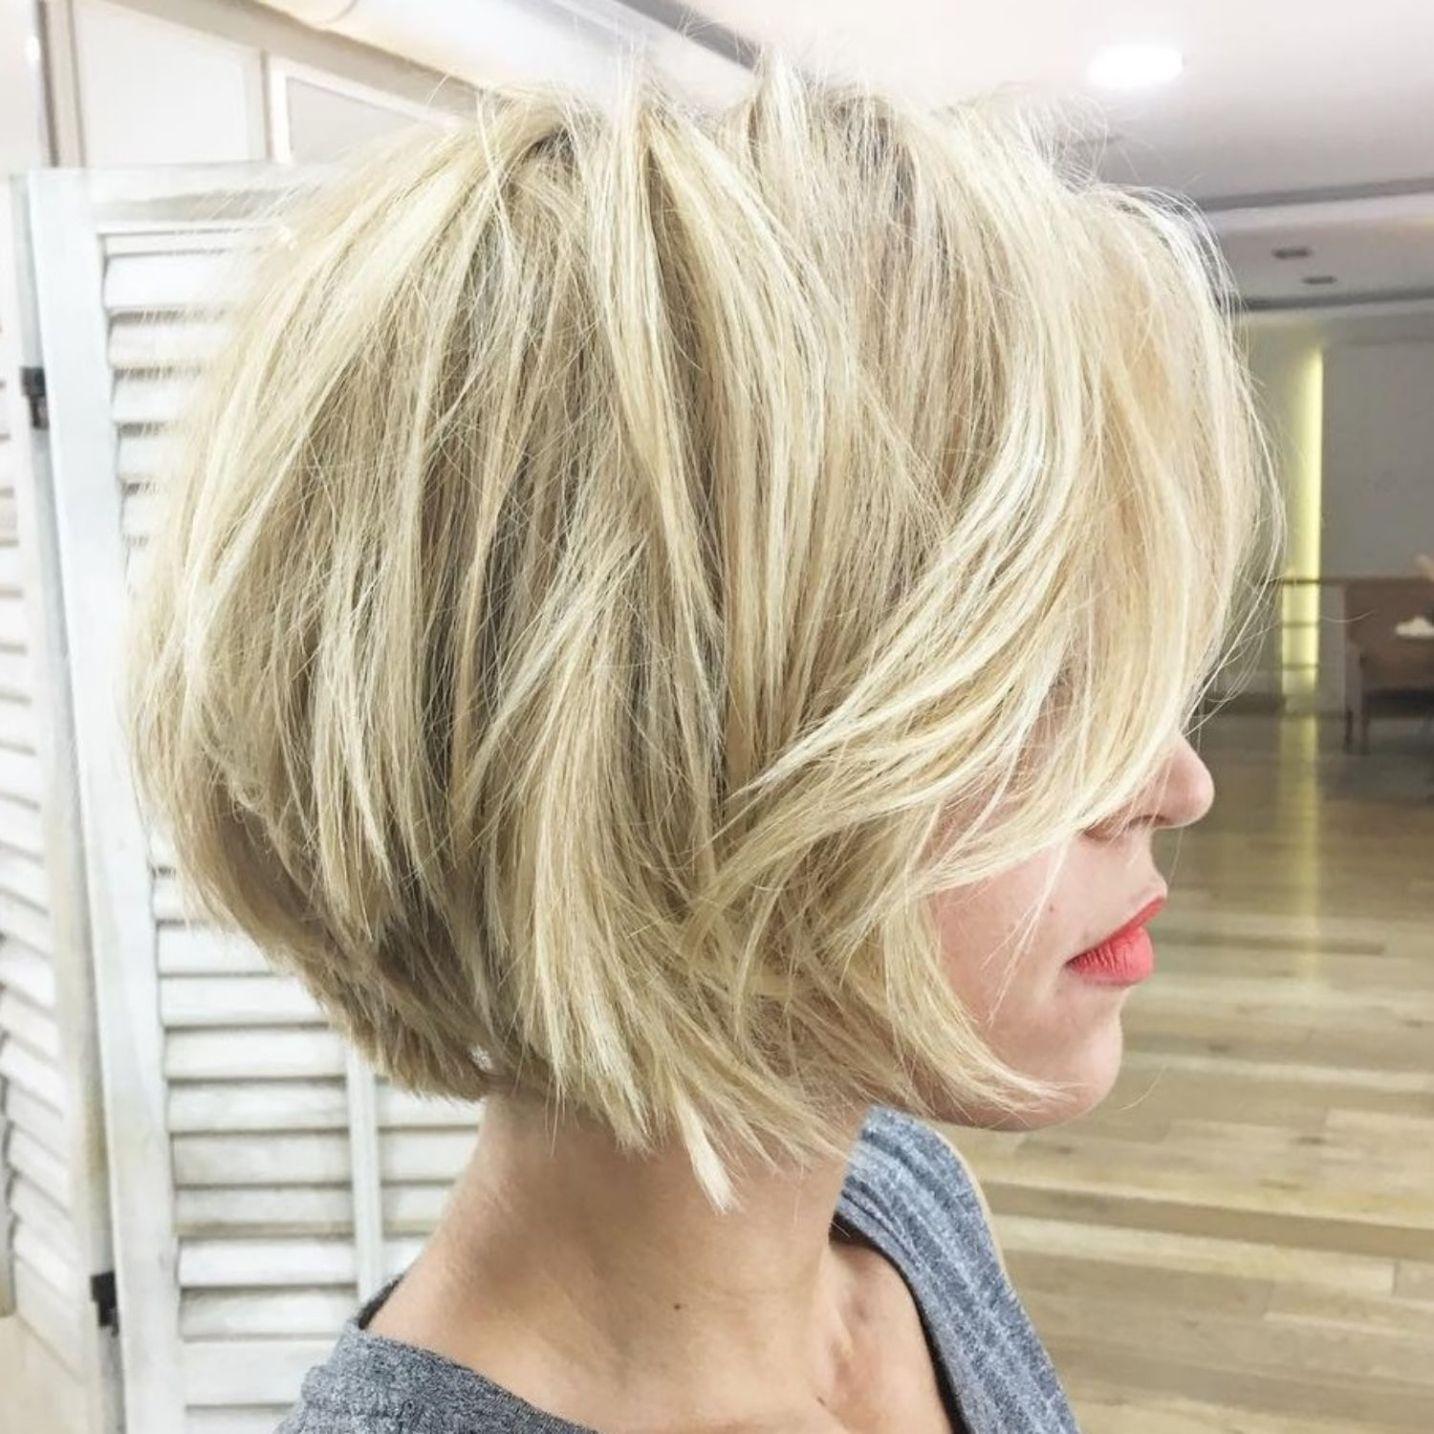 100 Mind Blowing Short Hairstyles For Fine Hair 100 Mind Blowing Short Hairstyles For Fine Hair Short Coiffure Cheveux Fins Coupe De Cheveux Coiffure Courte